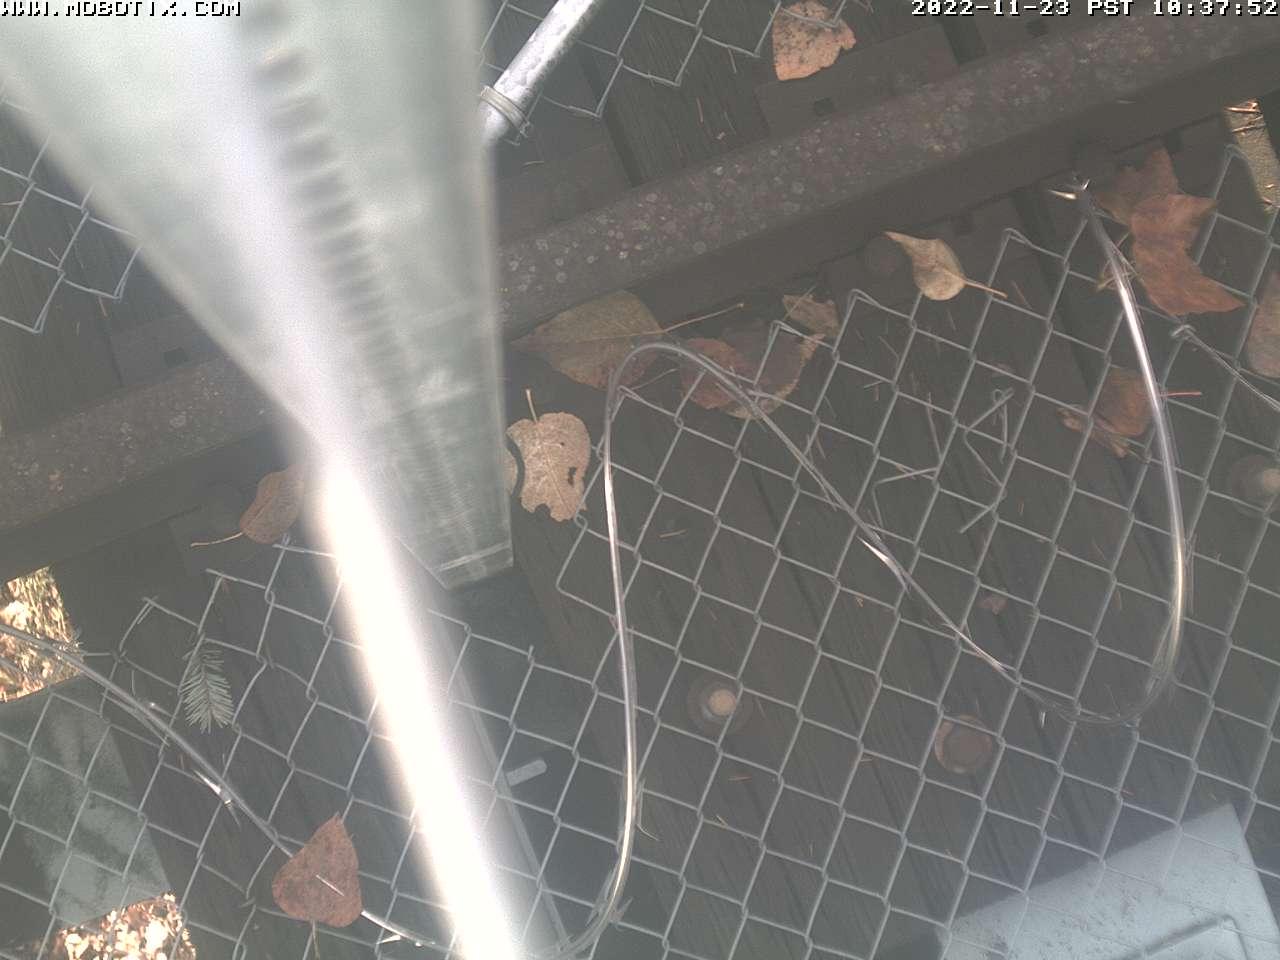 116th interchange construction camera still image